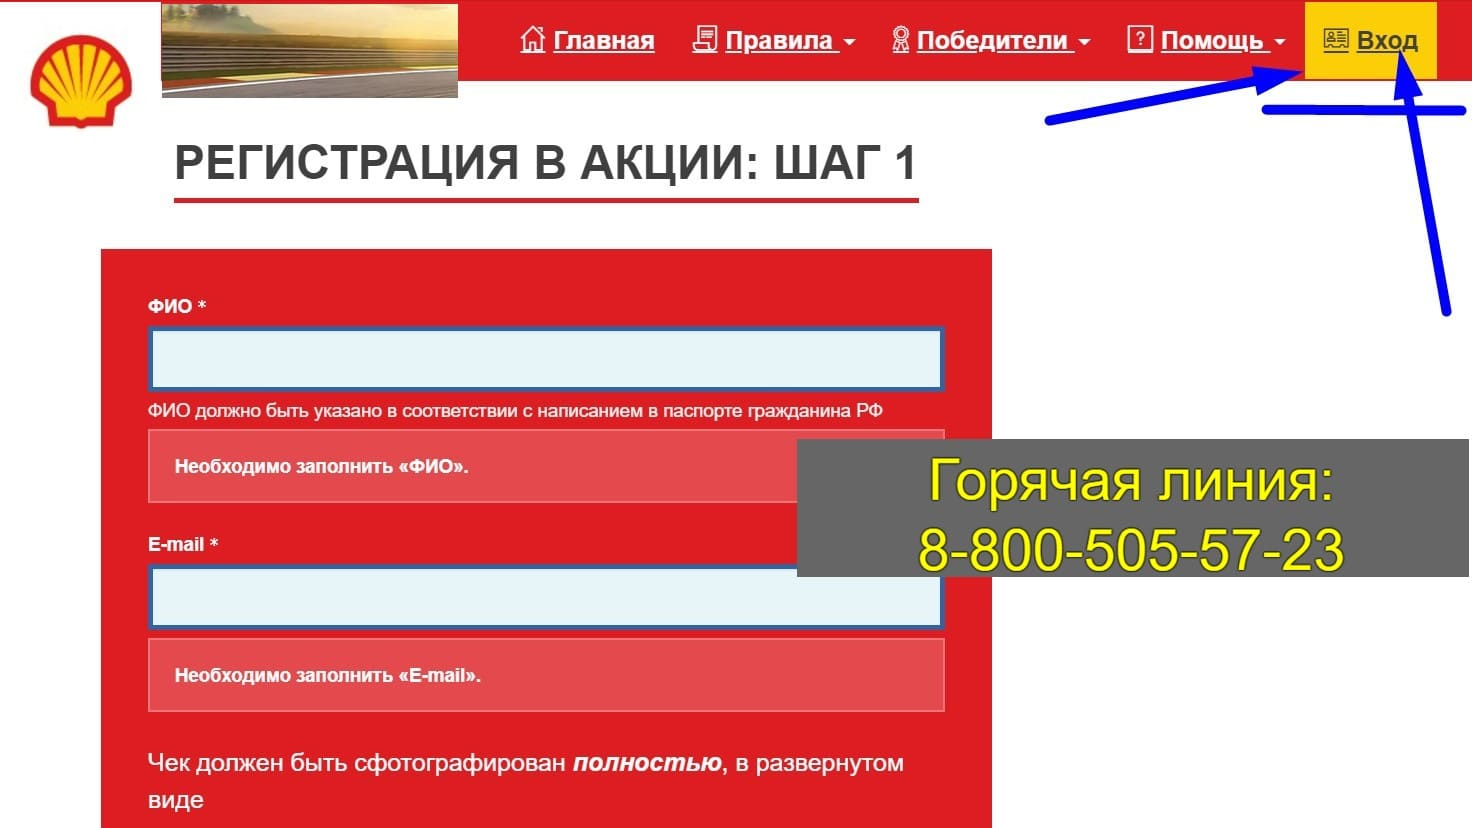 Shell com ru vp promo личный кабинет